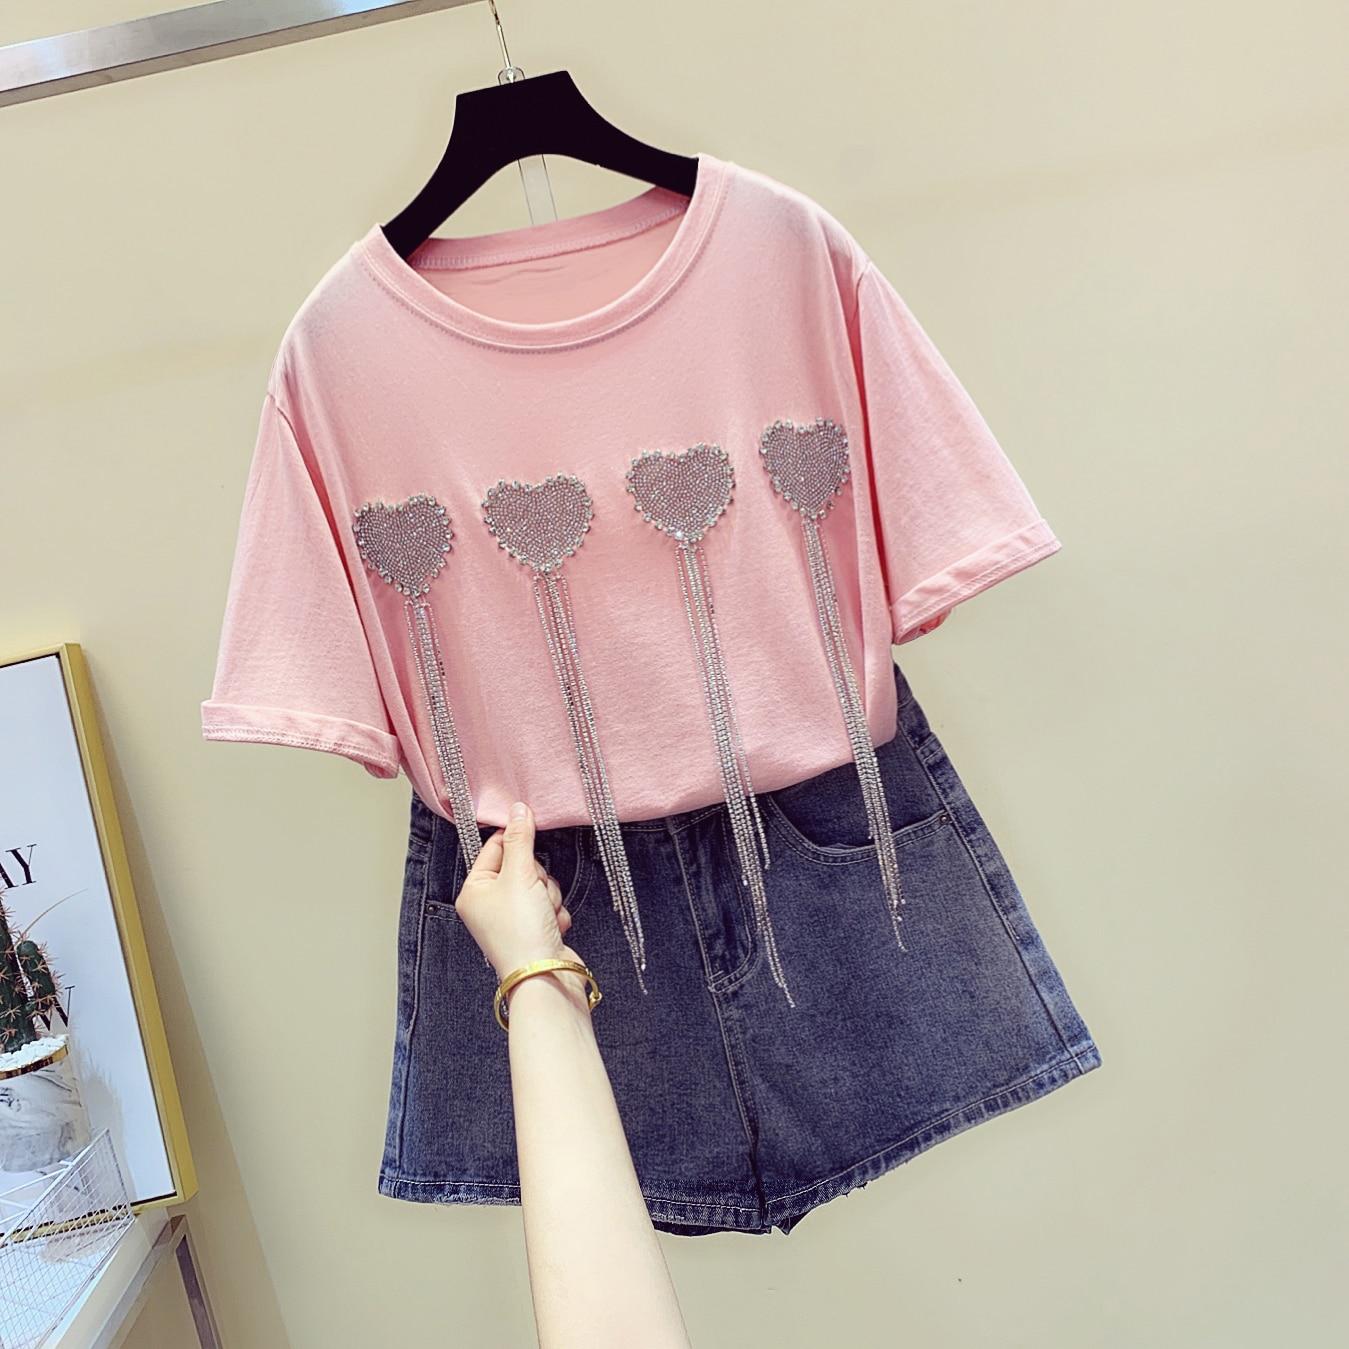 New Love Pattern Summer T-shirt Girls2019 Drill Chain Short-sleeve Candy Color T-shirts Women